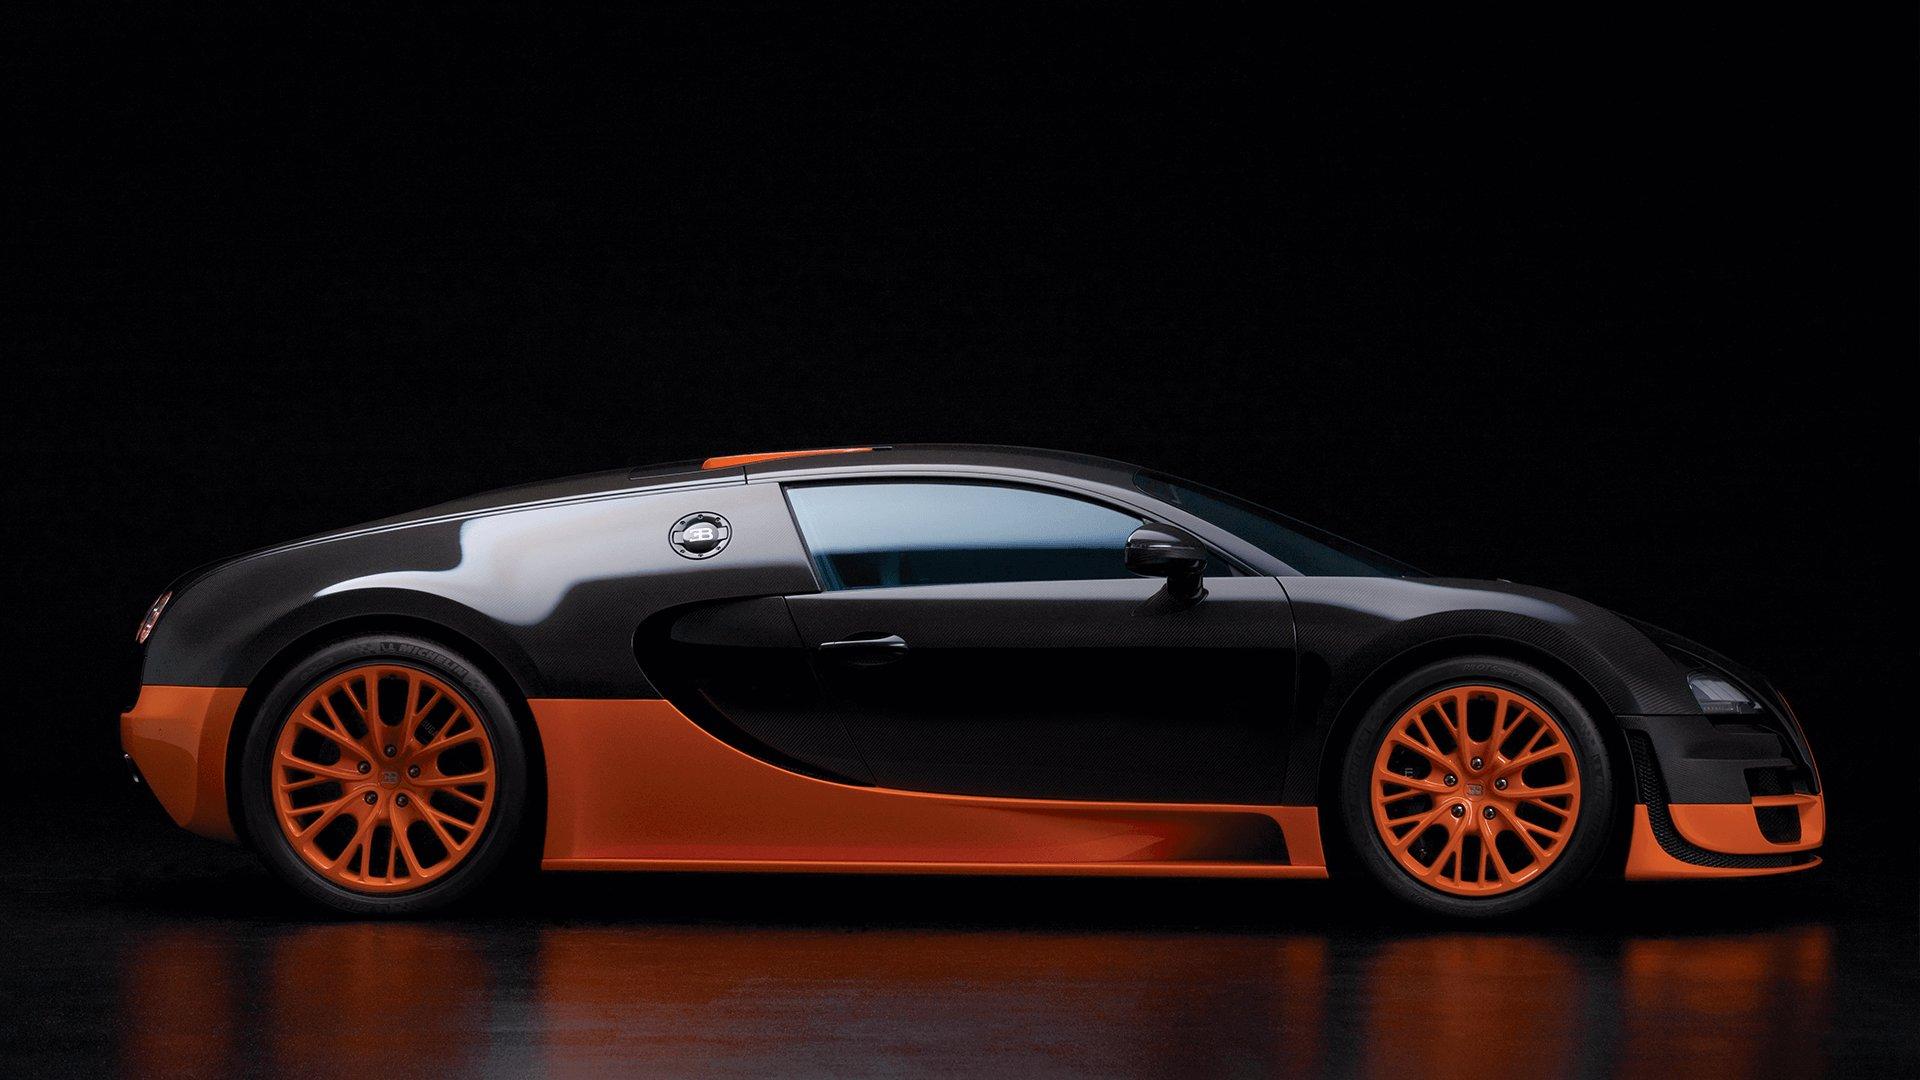 Bugatti Veyron Super Sport - Fastest cars in the world 2020